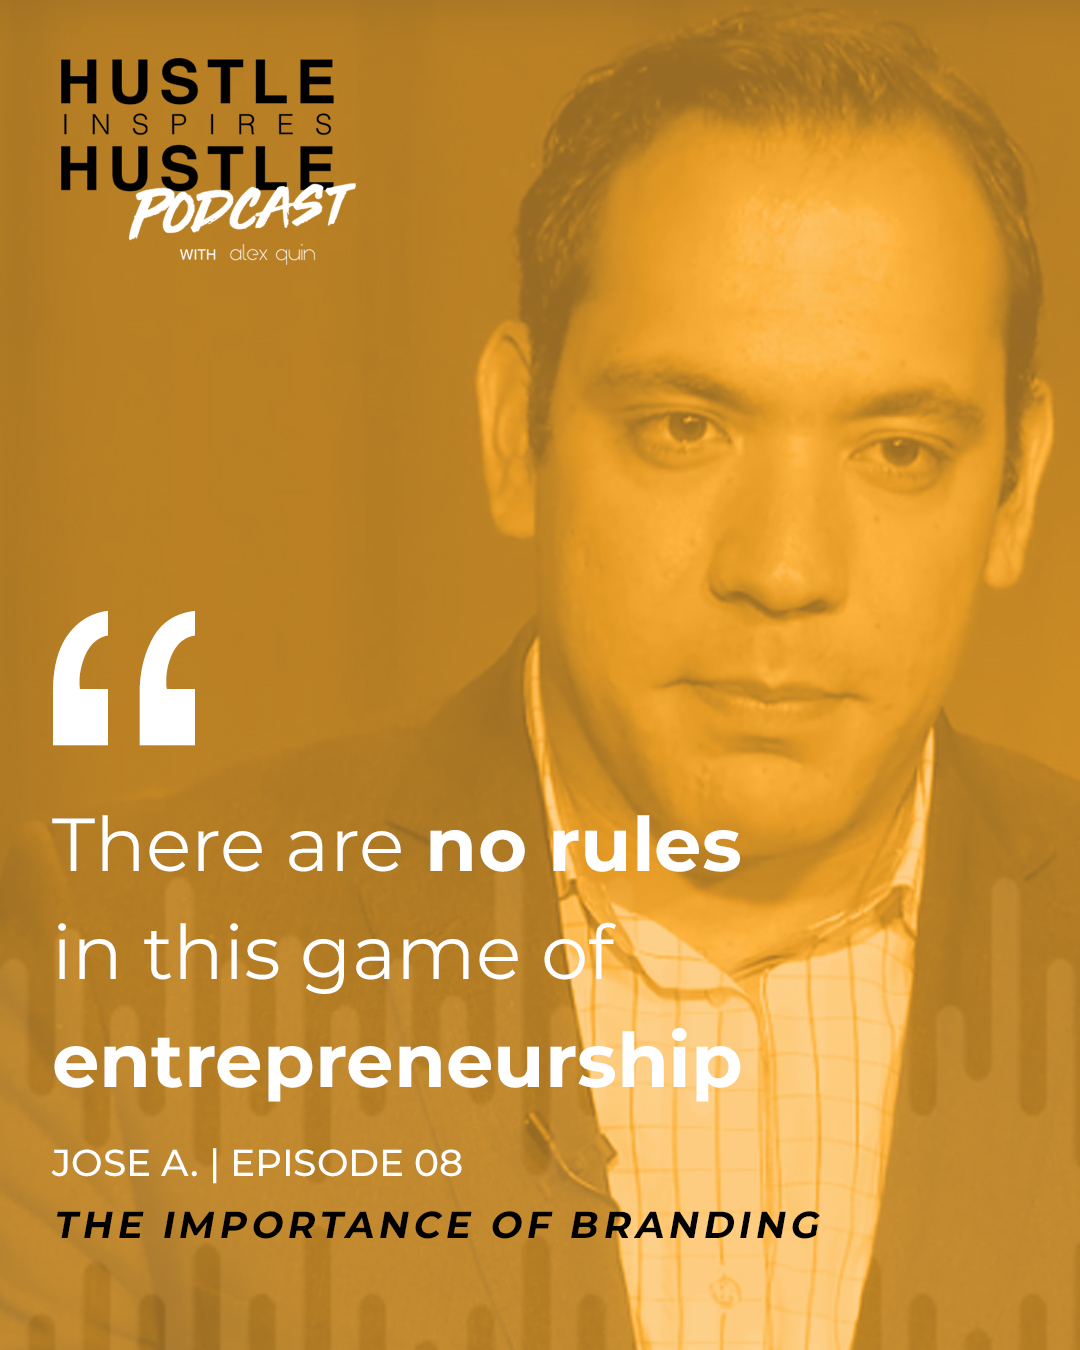 Jose Aristimuno & Alex Quin - On Hustle Inspires Hustle Podcast